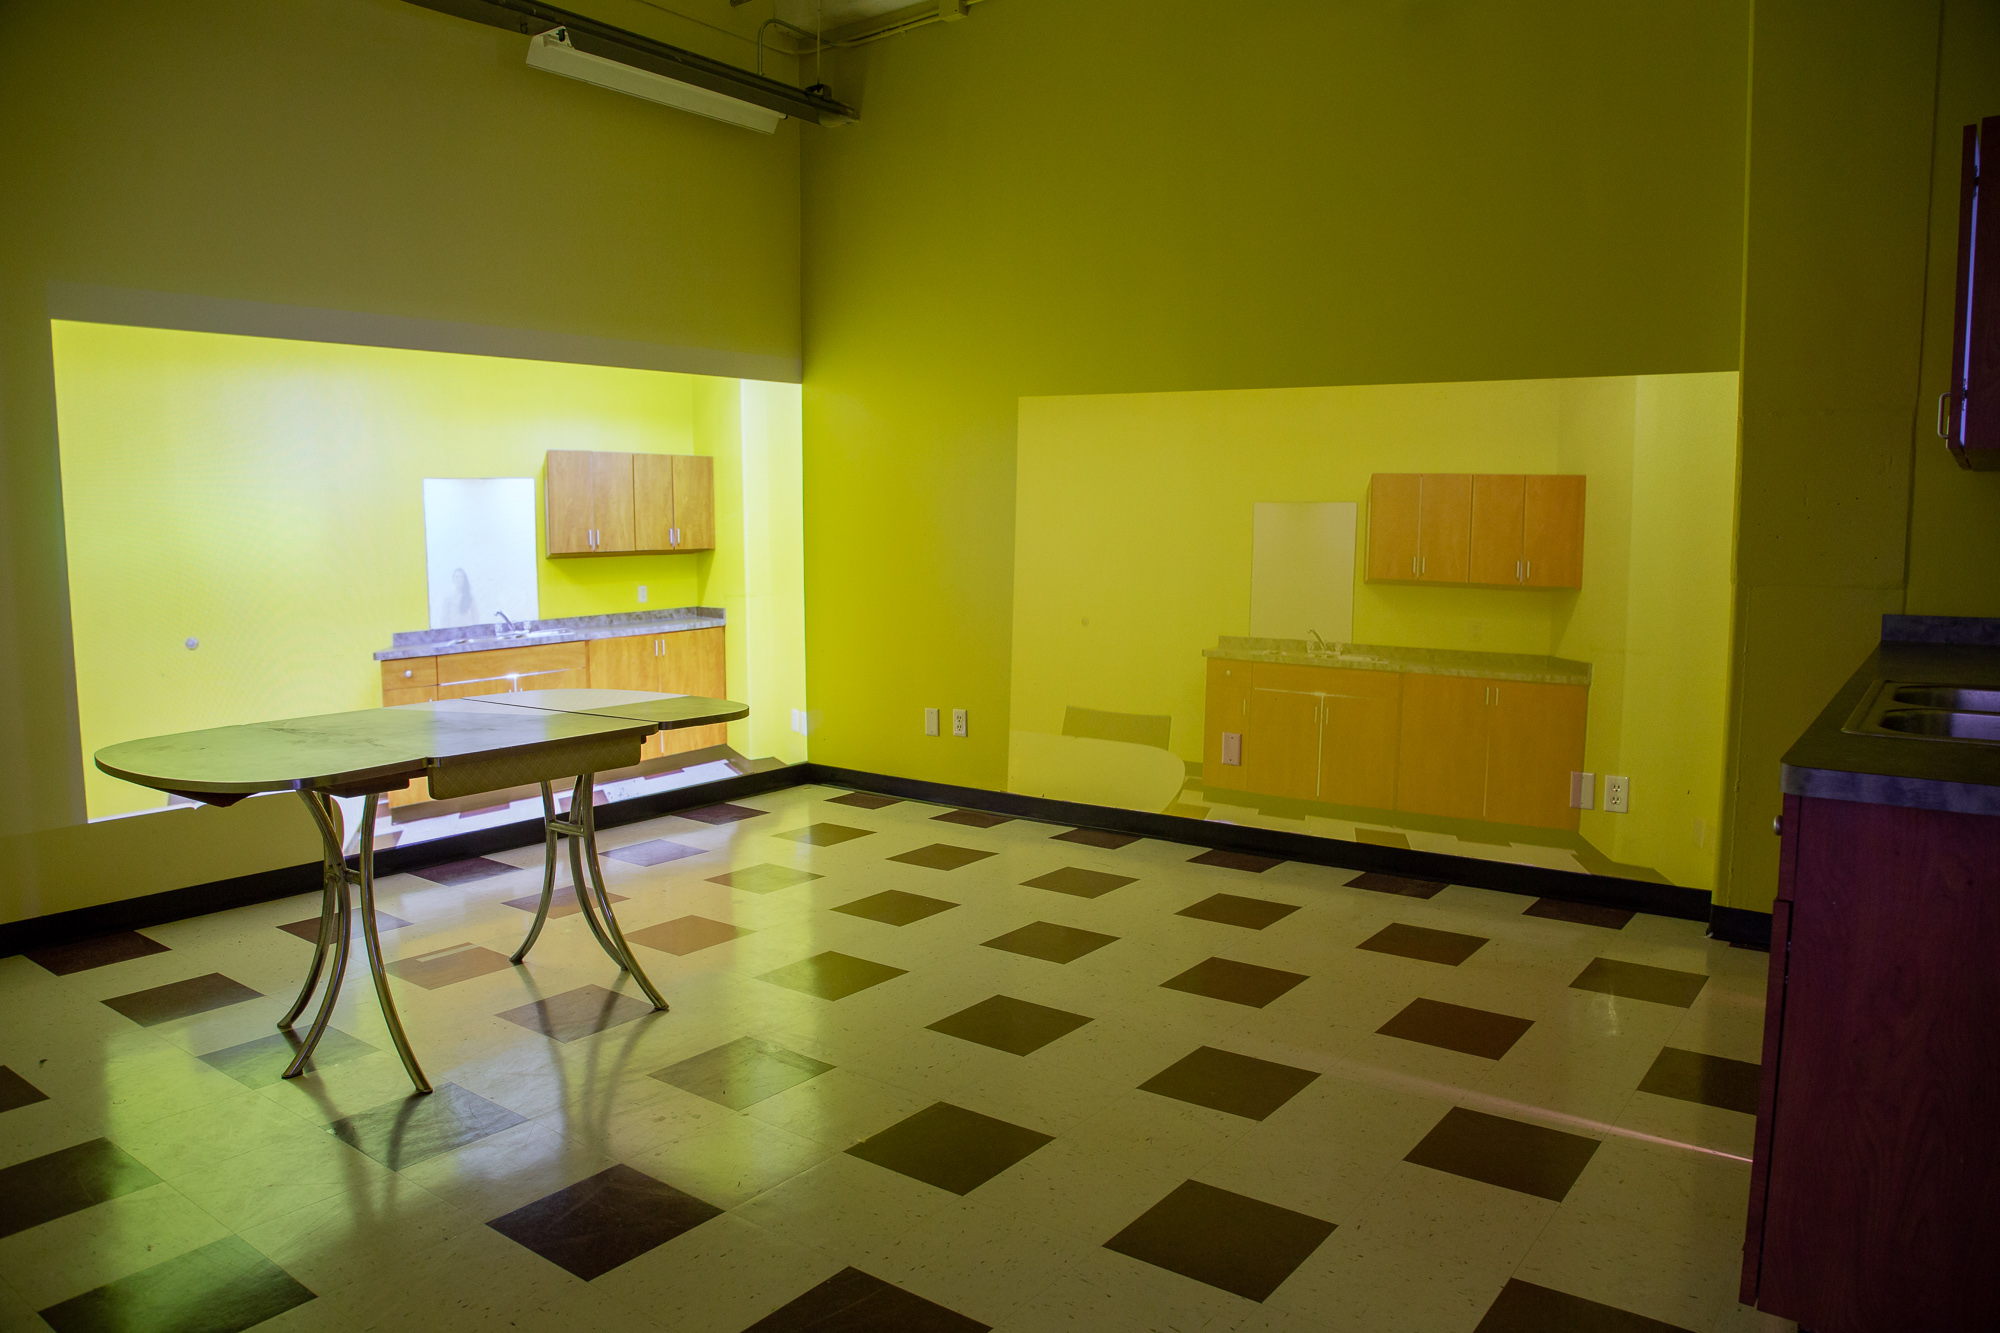 Alexandres_Delirium-Situ_Gilman_Yellow_Installation-IMG_6241.jpg